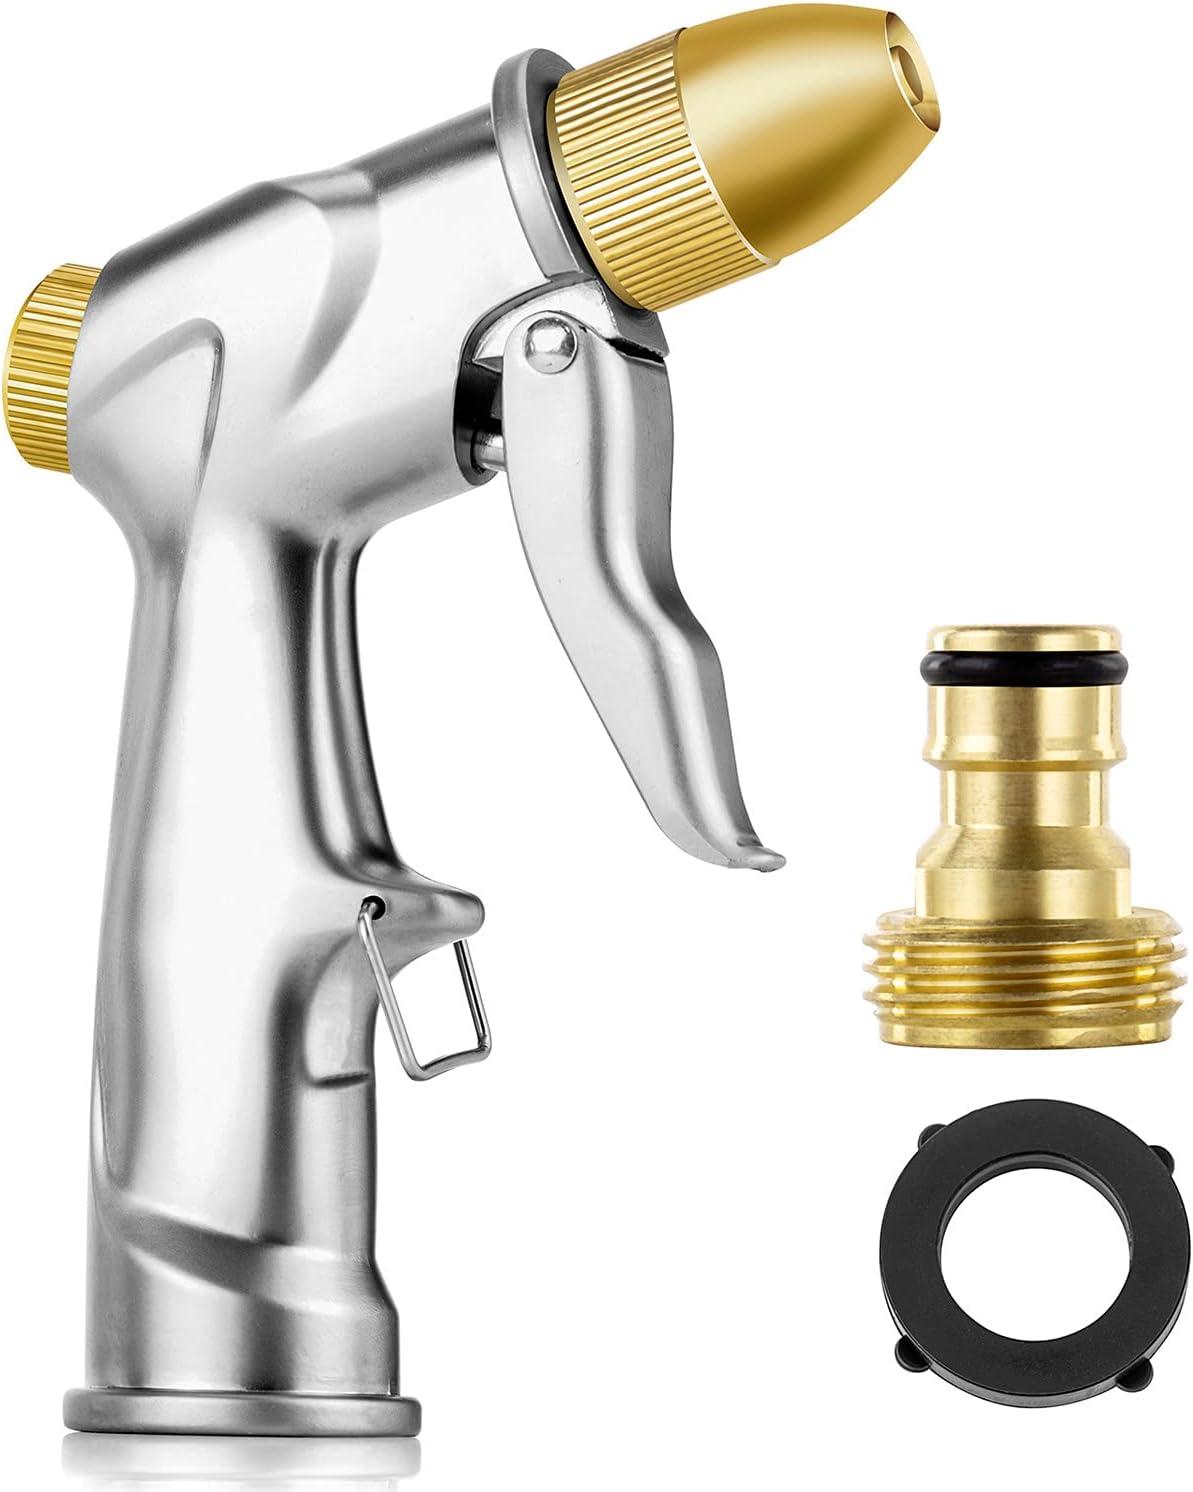 Doset Upgrade Garden Hose Nozzle Handheld 100% Memphis Mall Houston Mall Metal Duty Heavy